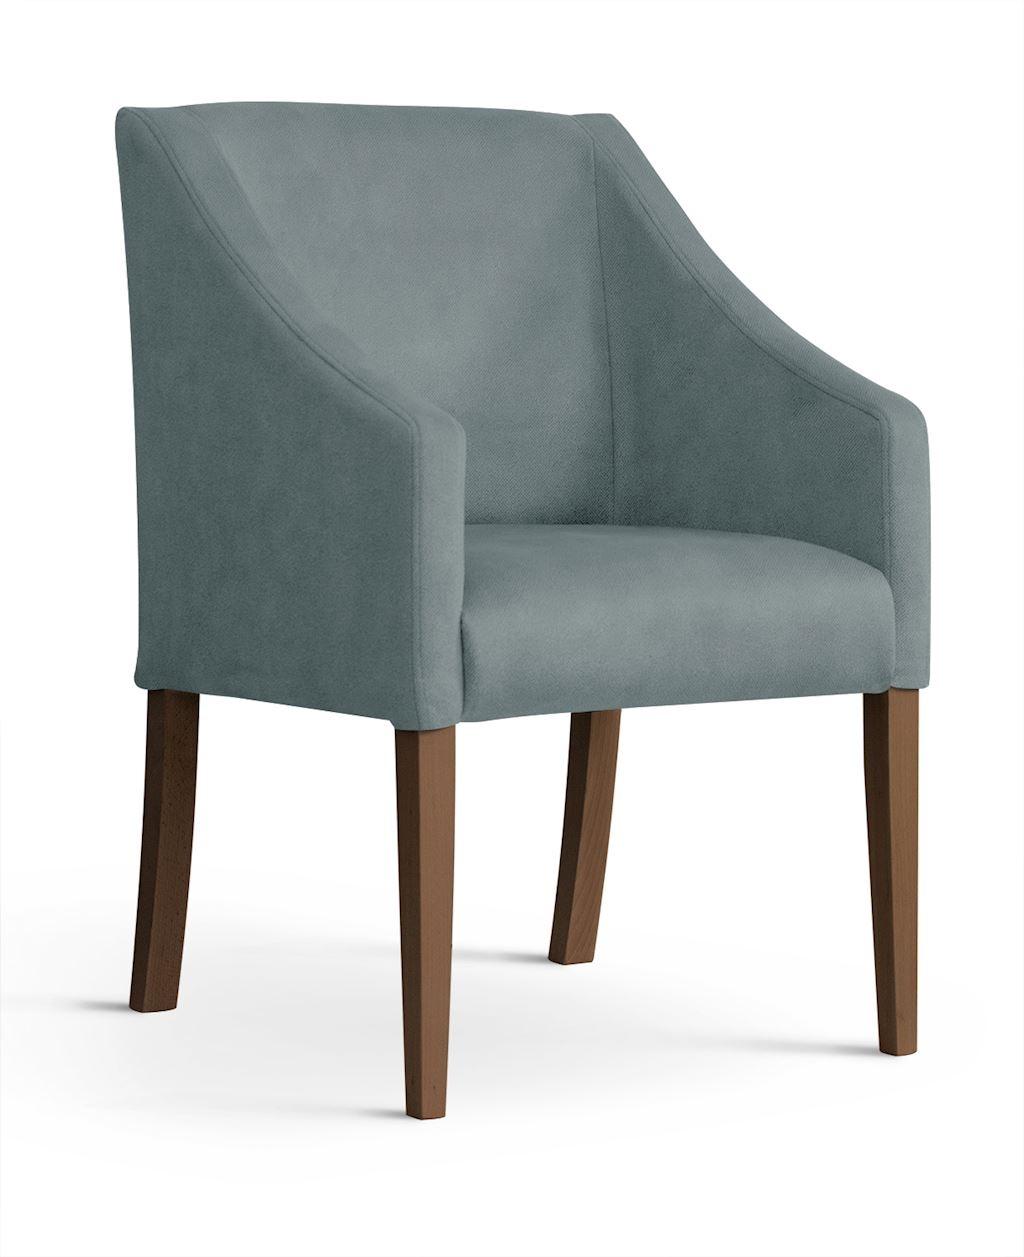 Fotoliu fix tapitat cu stofa, cu picioare din lemn Capri Grey / Walnut, l58xA60xH89 cm imagine